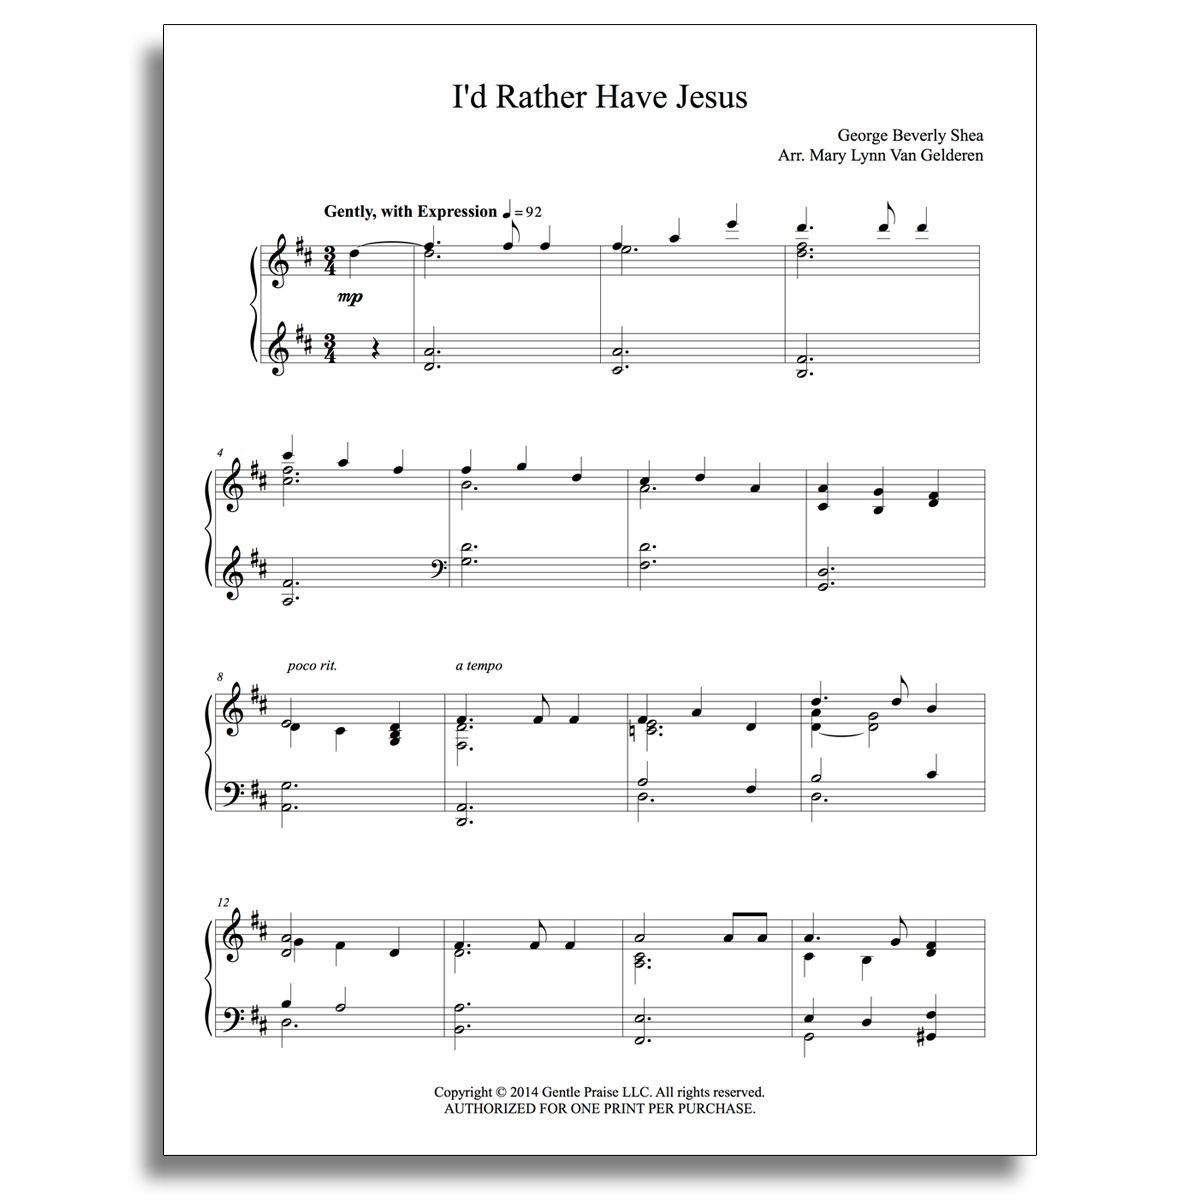 1-hymns And Spirituals